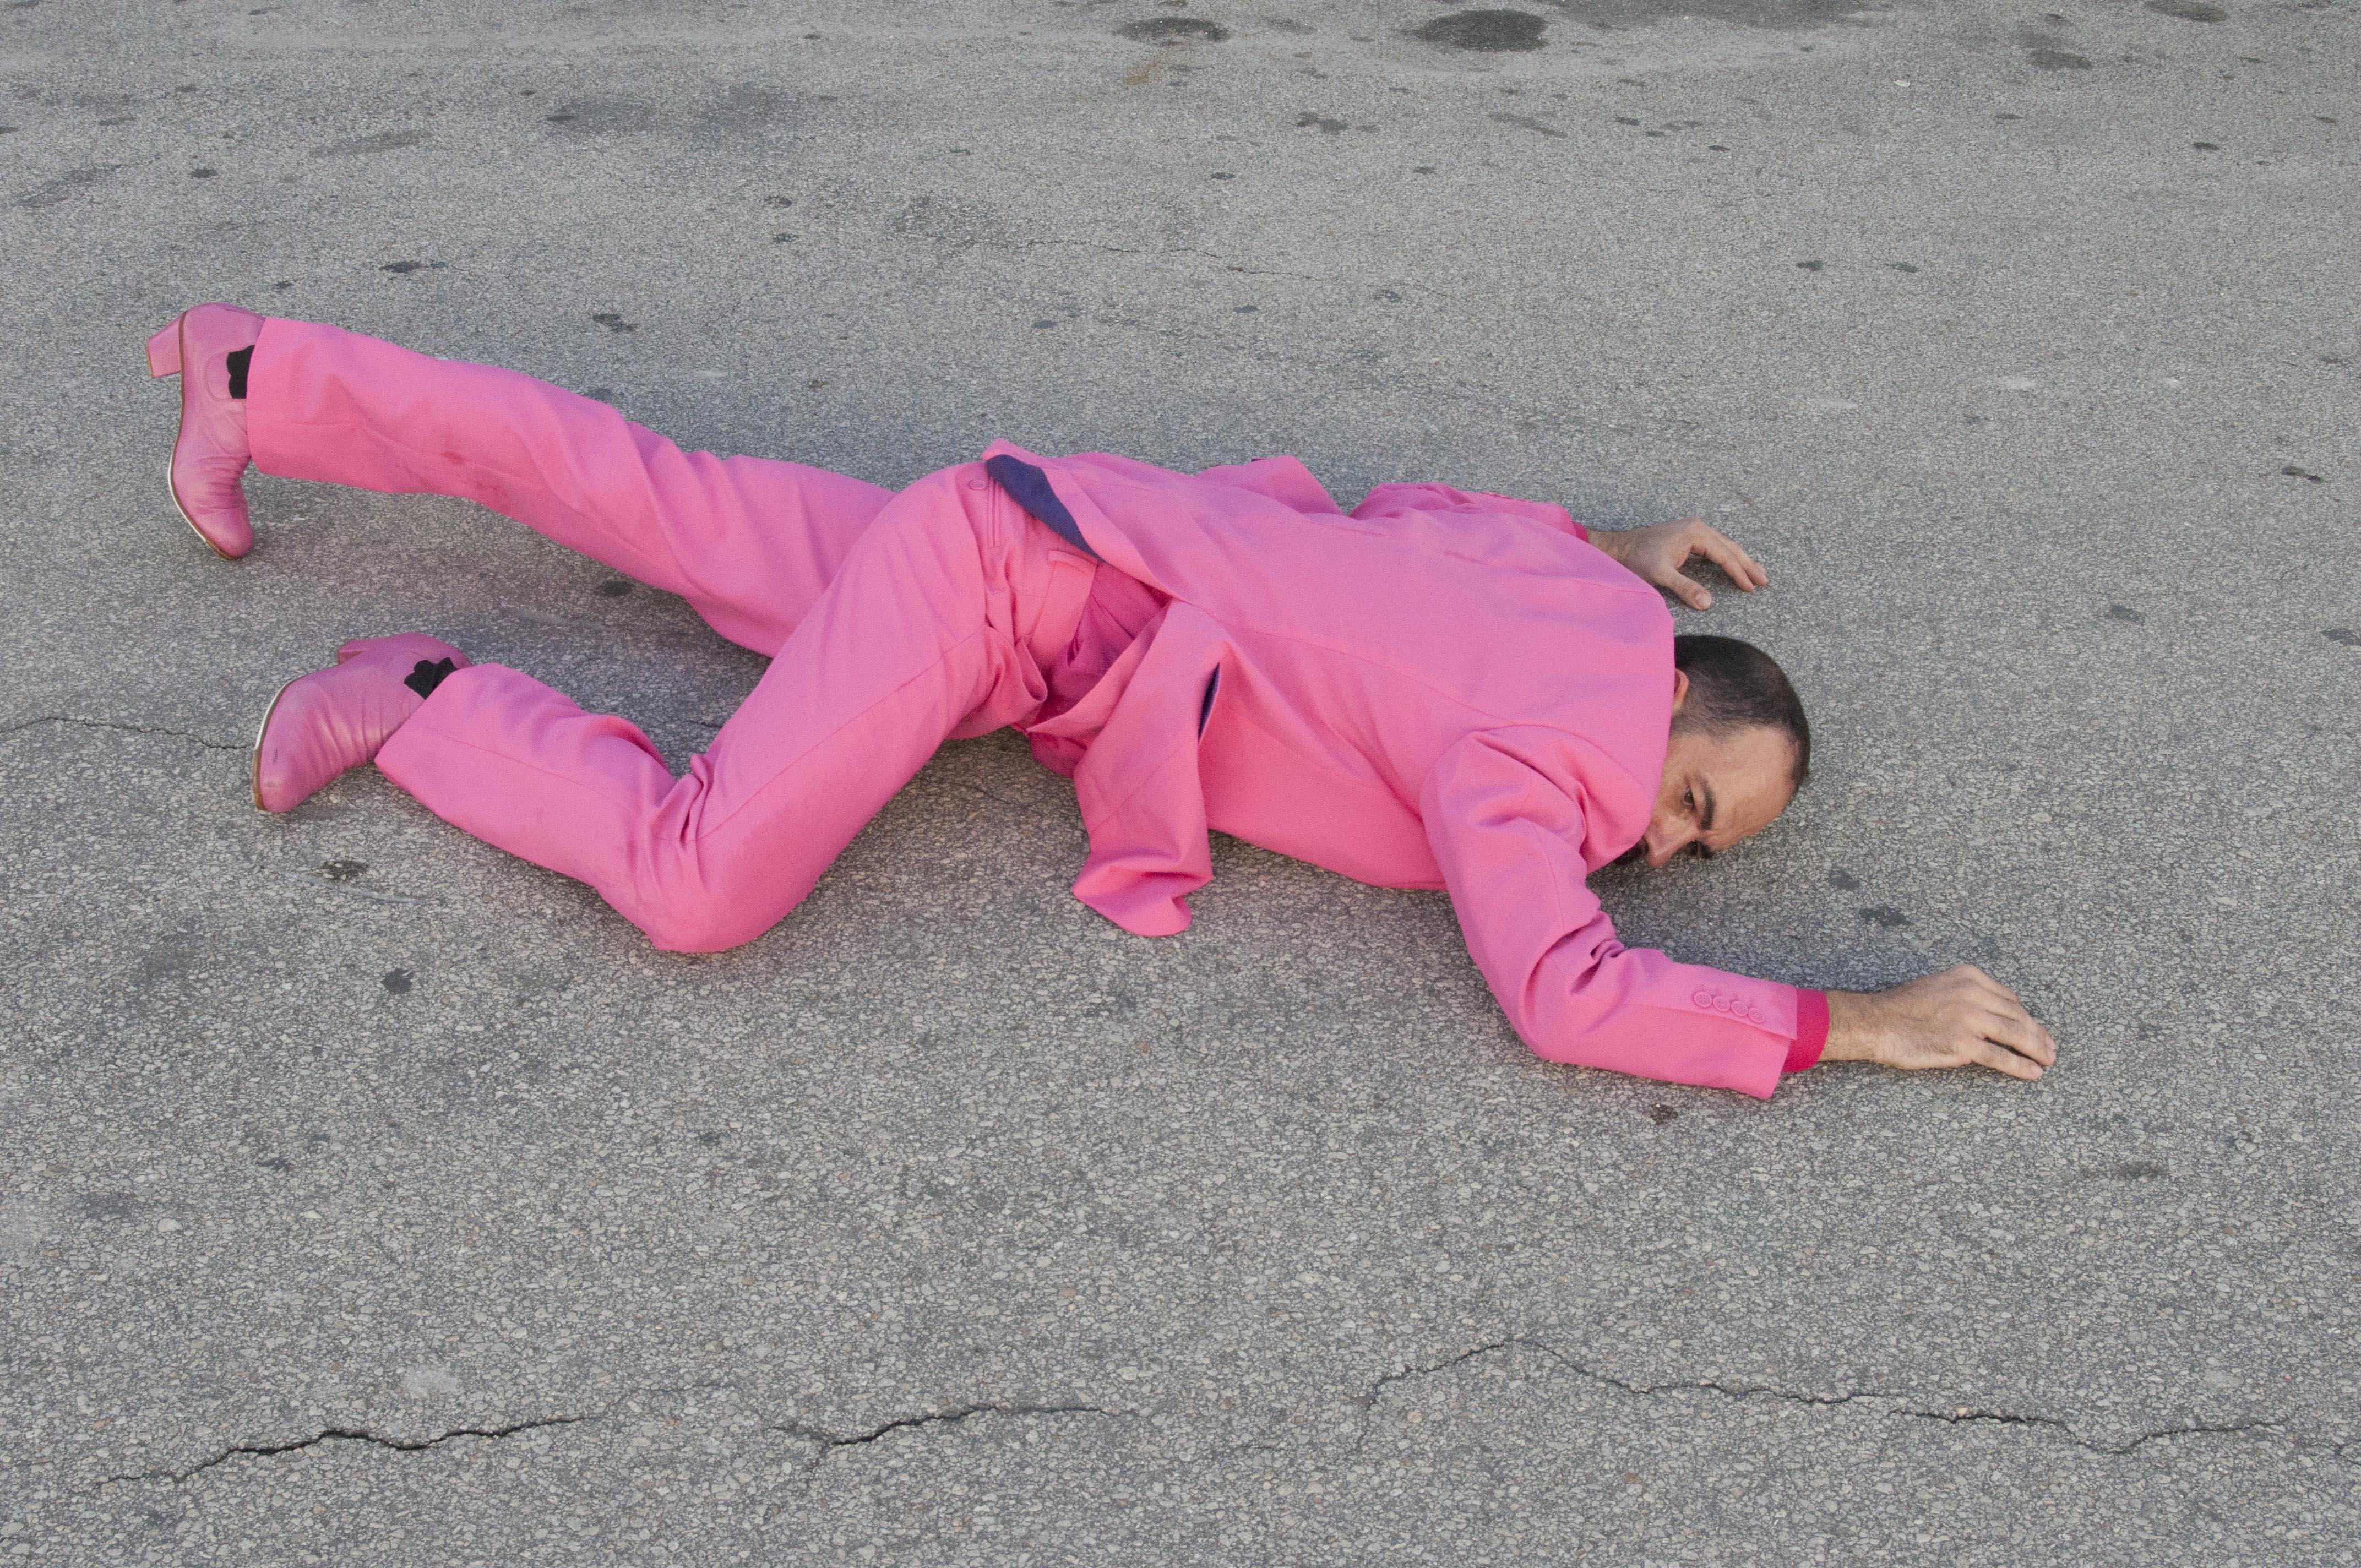 Foto Flamencotaenzer Juan Carlos Lerida liegt am Boden_Foto von Manuel Romalde